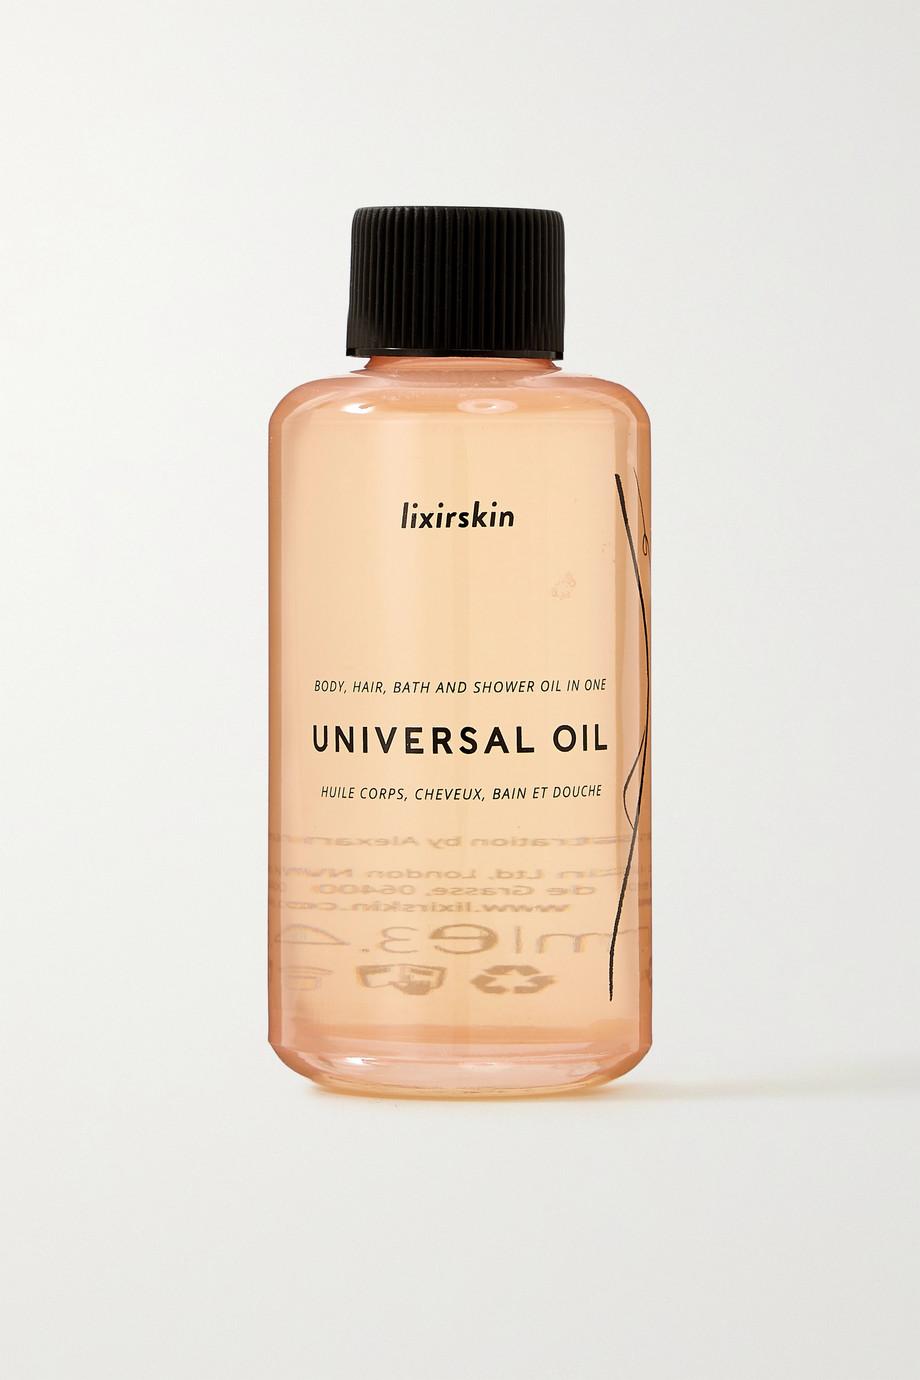 Lixirskin Universal Oil, 100ml